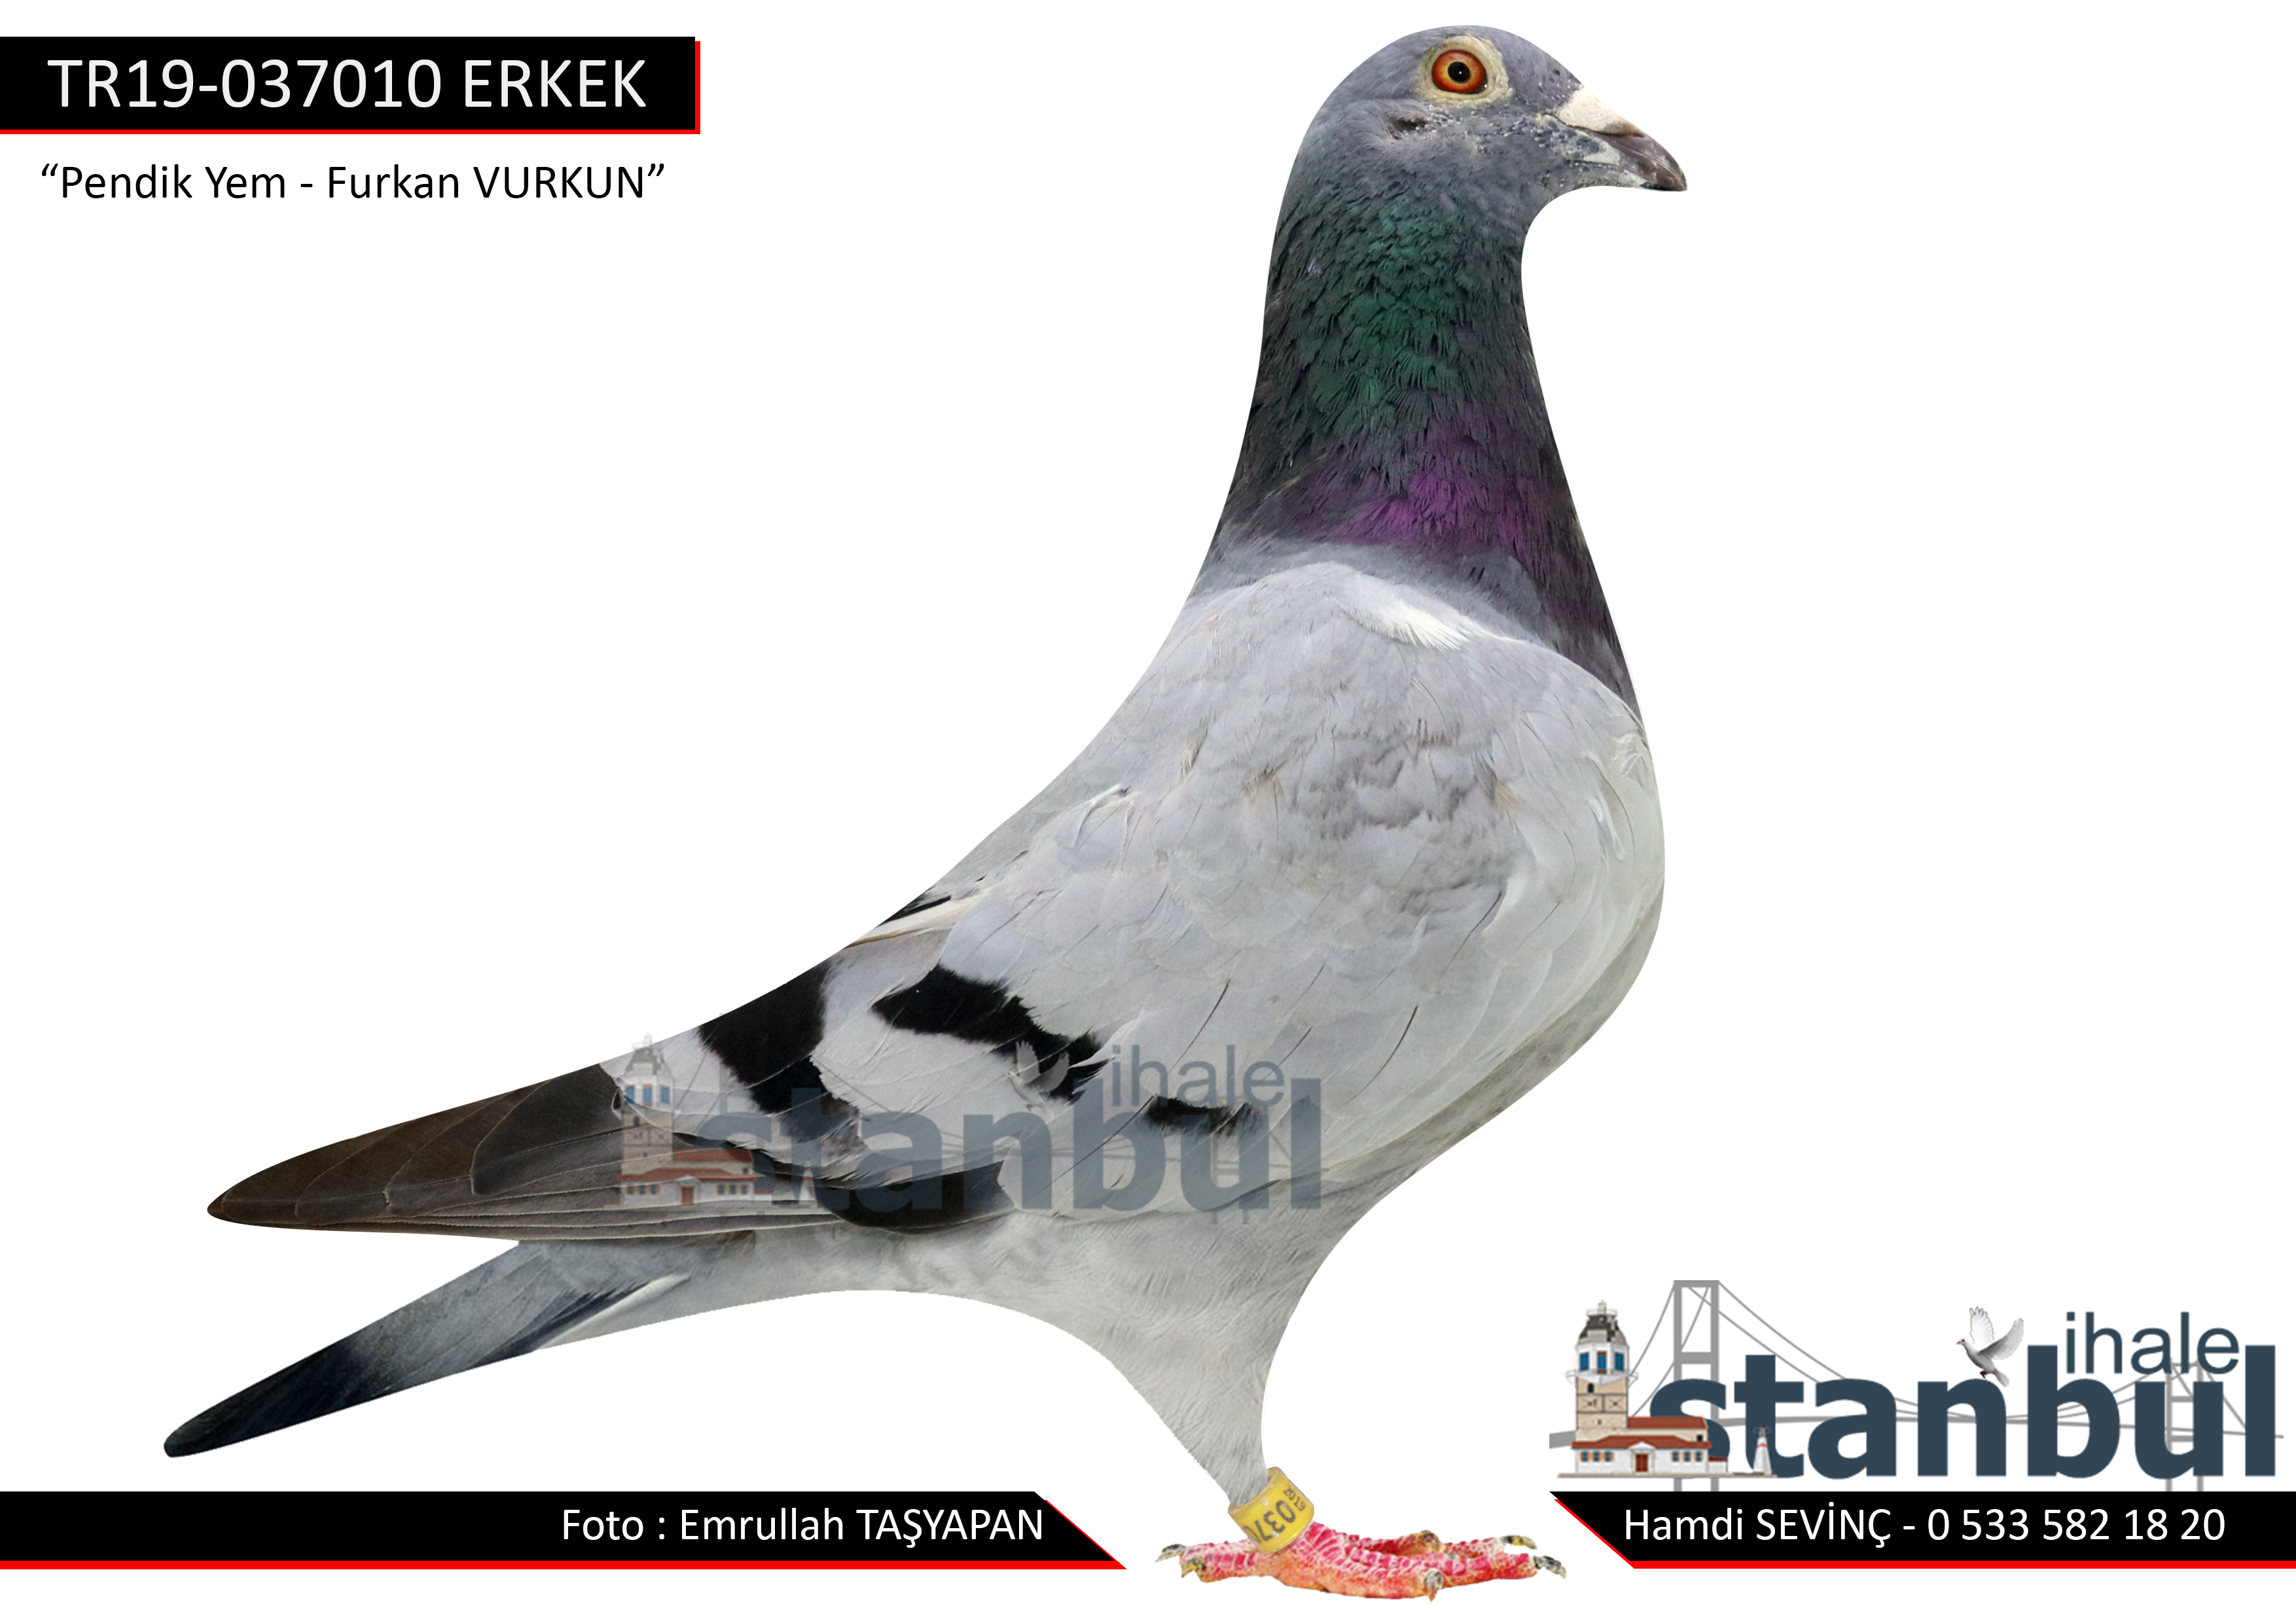 TR-19-037010 ERKEK %25 GABY %25 BARCELONA %25 GABY %25 P.VEENSTRA